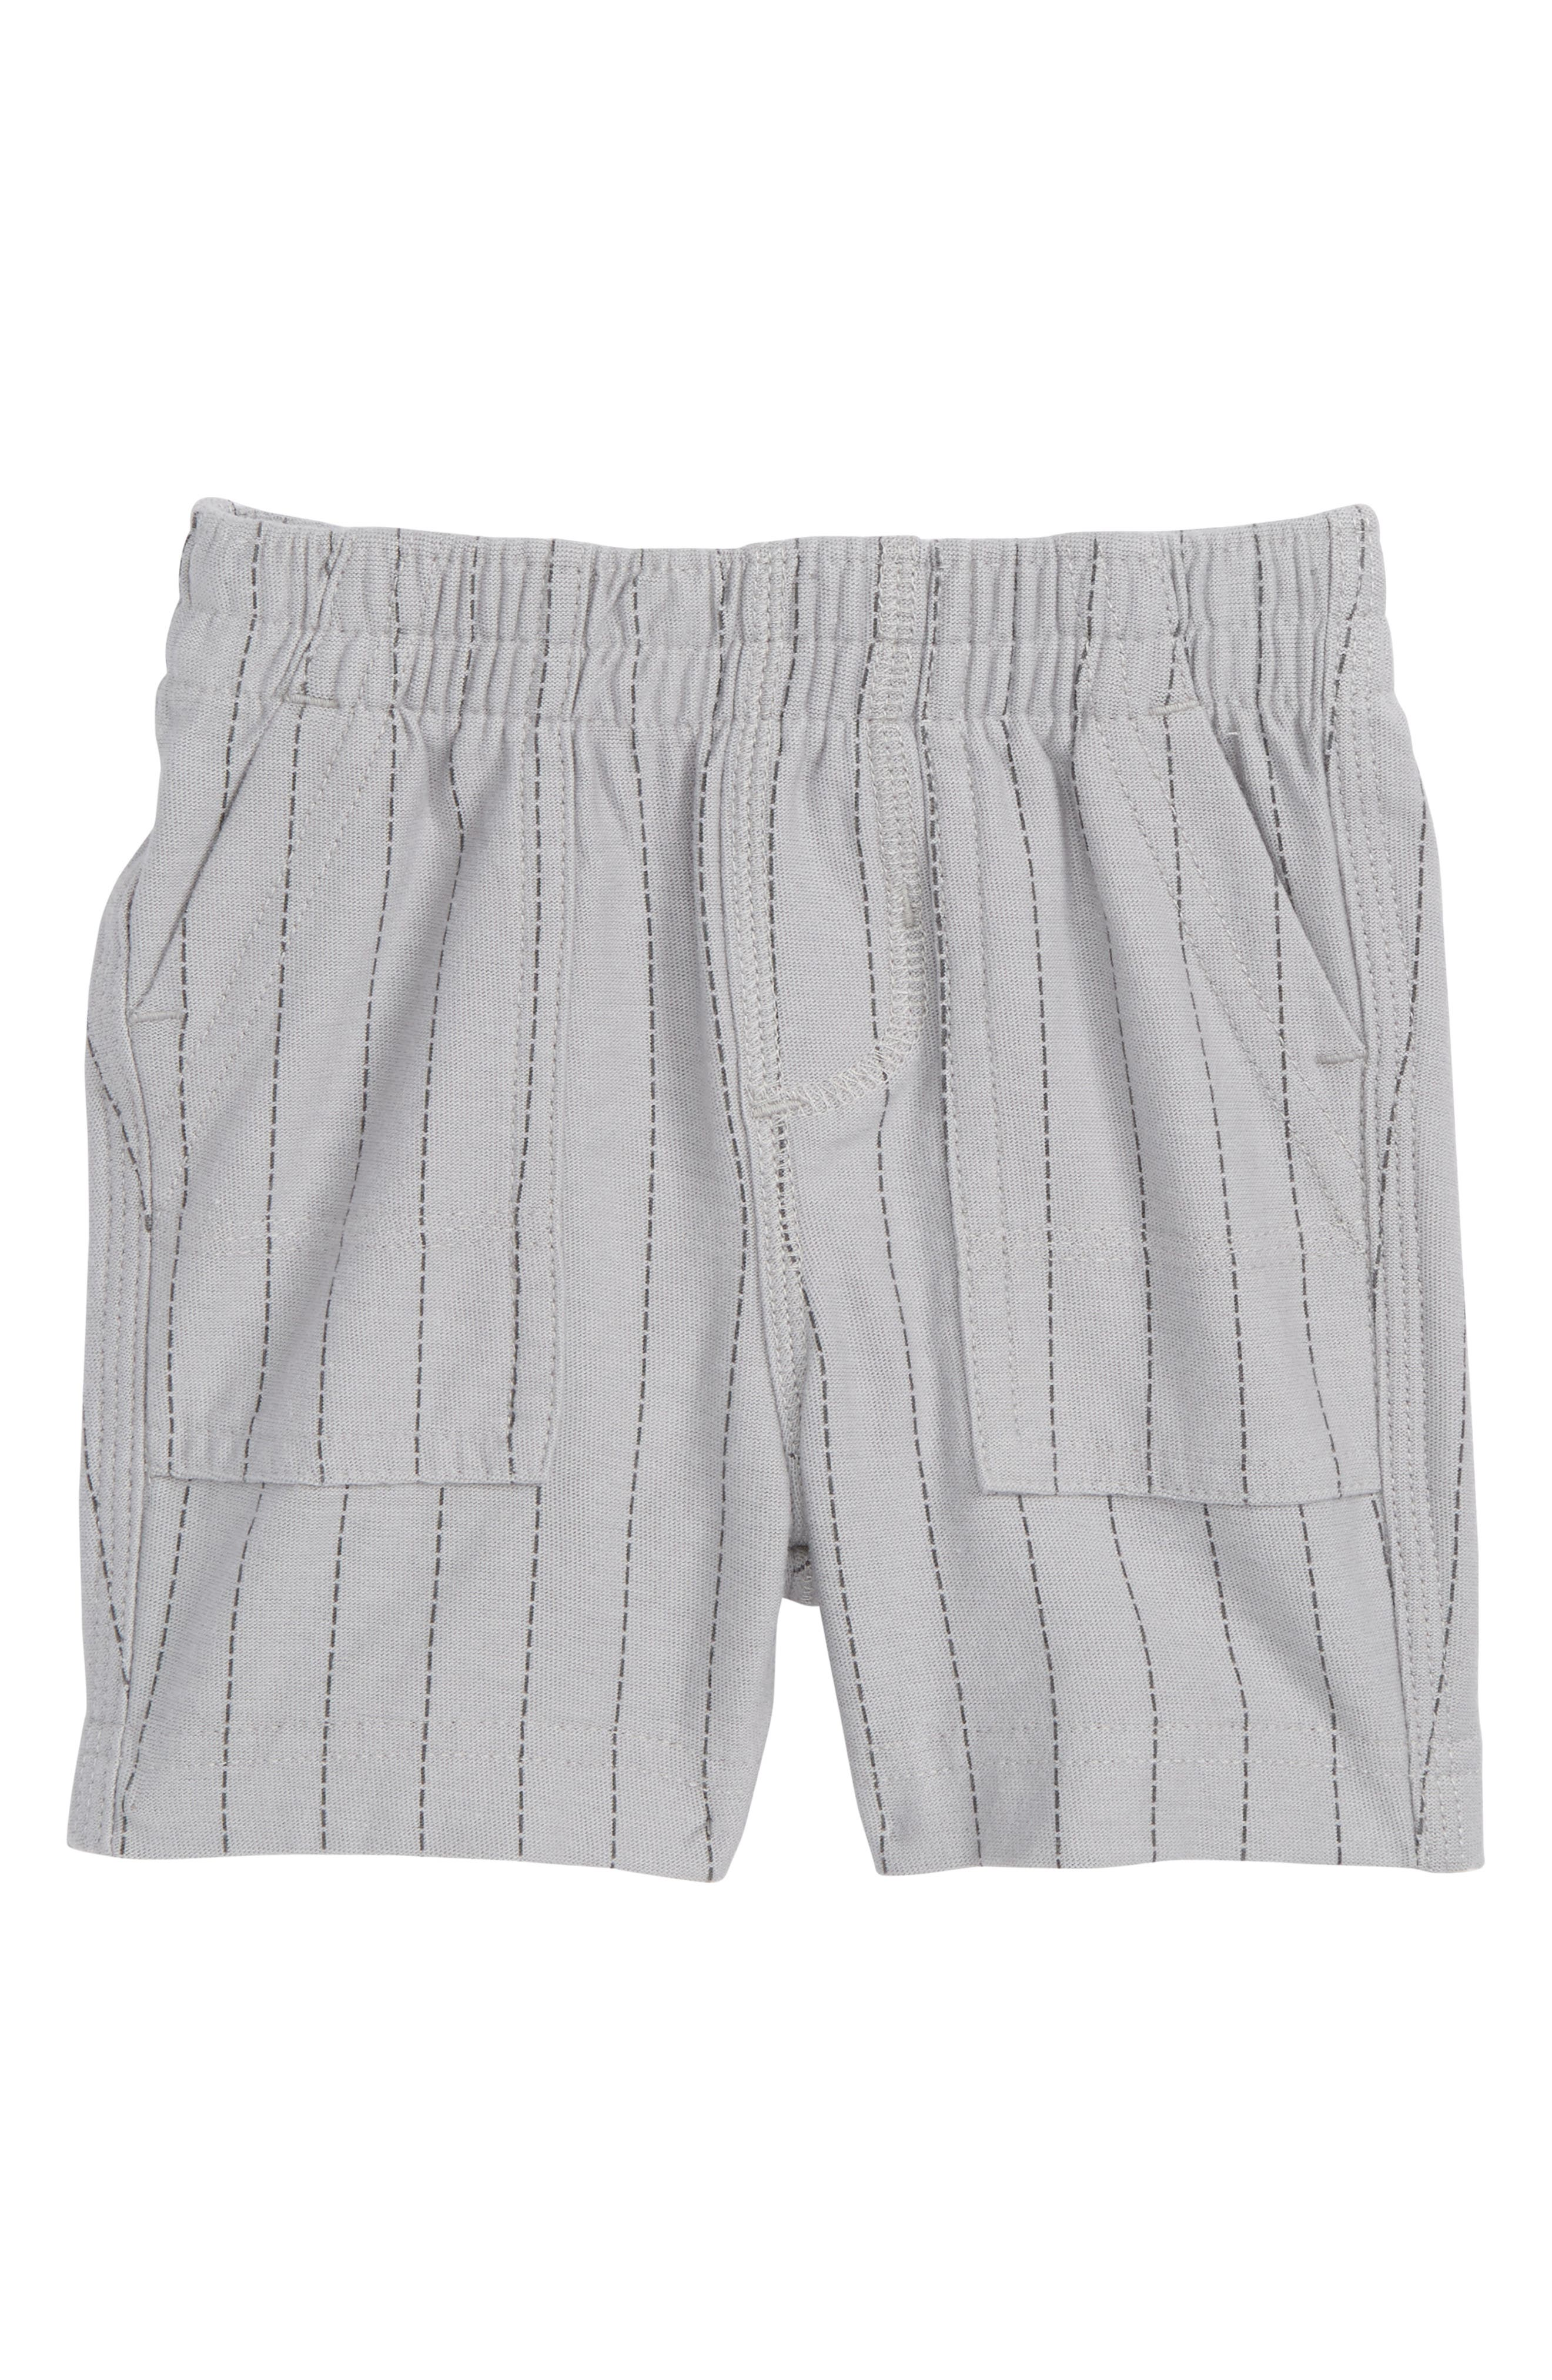 Stripe Shorts,                             Main thumbnail 1, color,                             Storm Grey Ticking Stripe